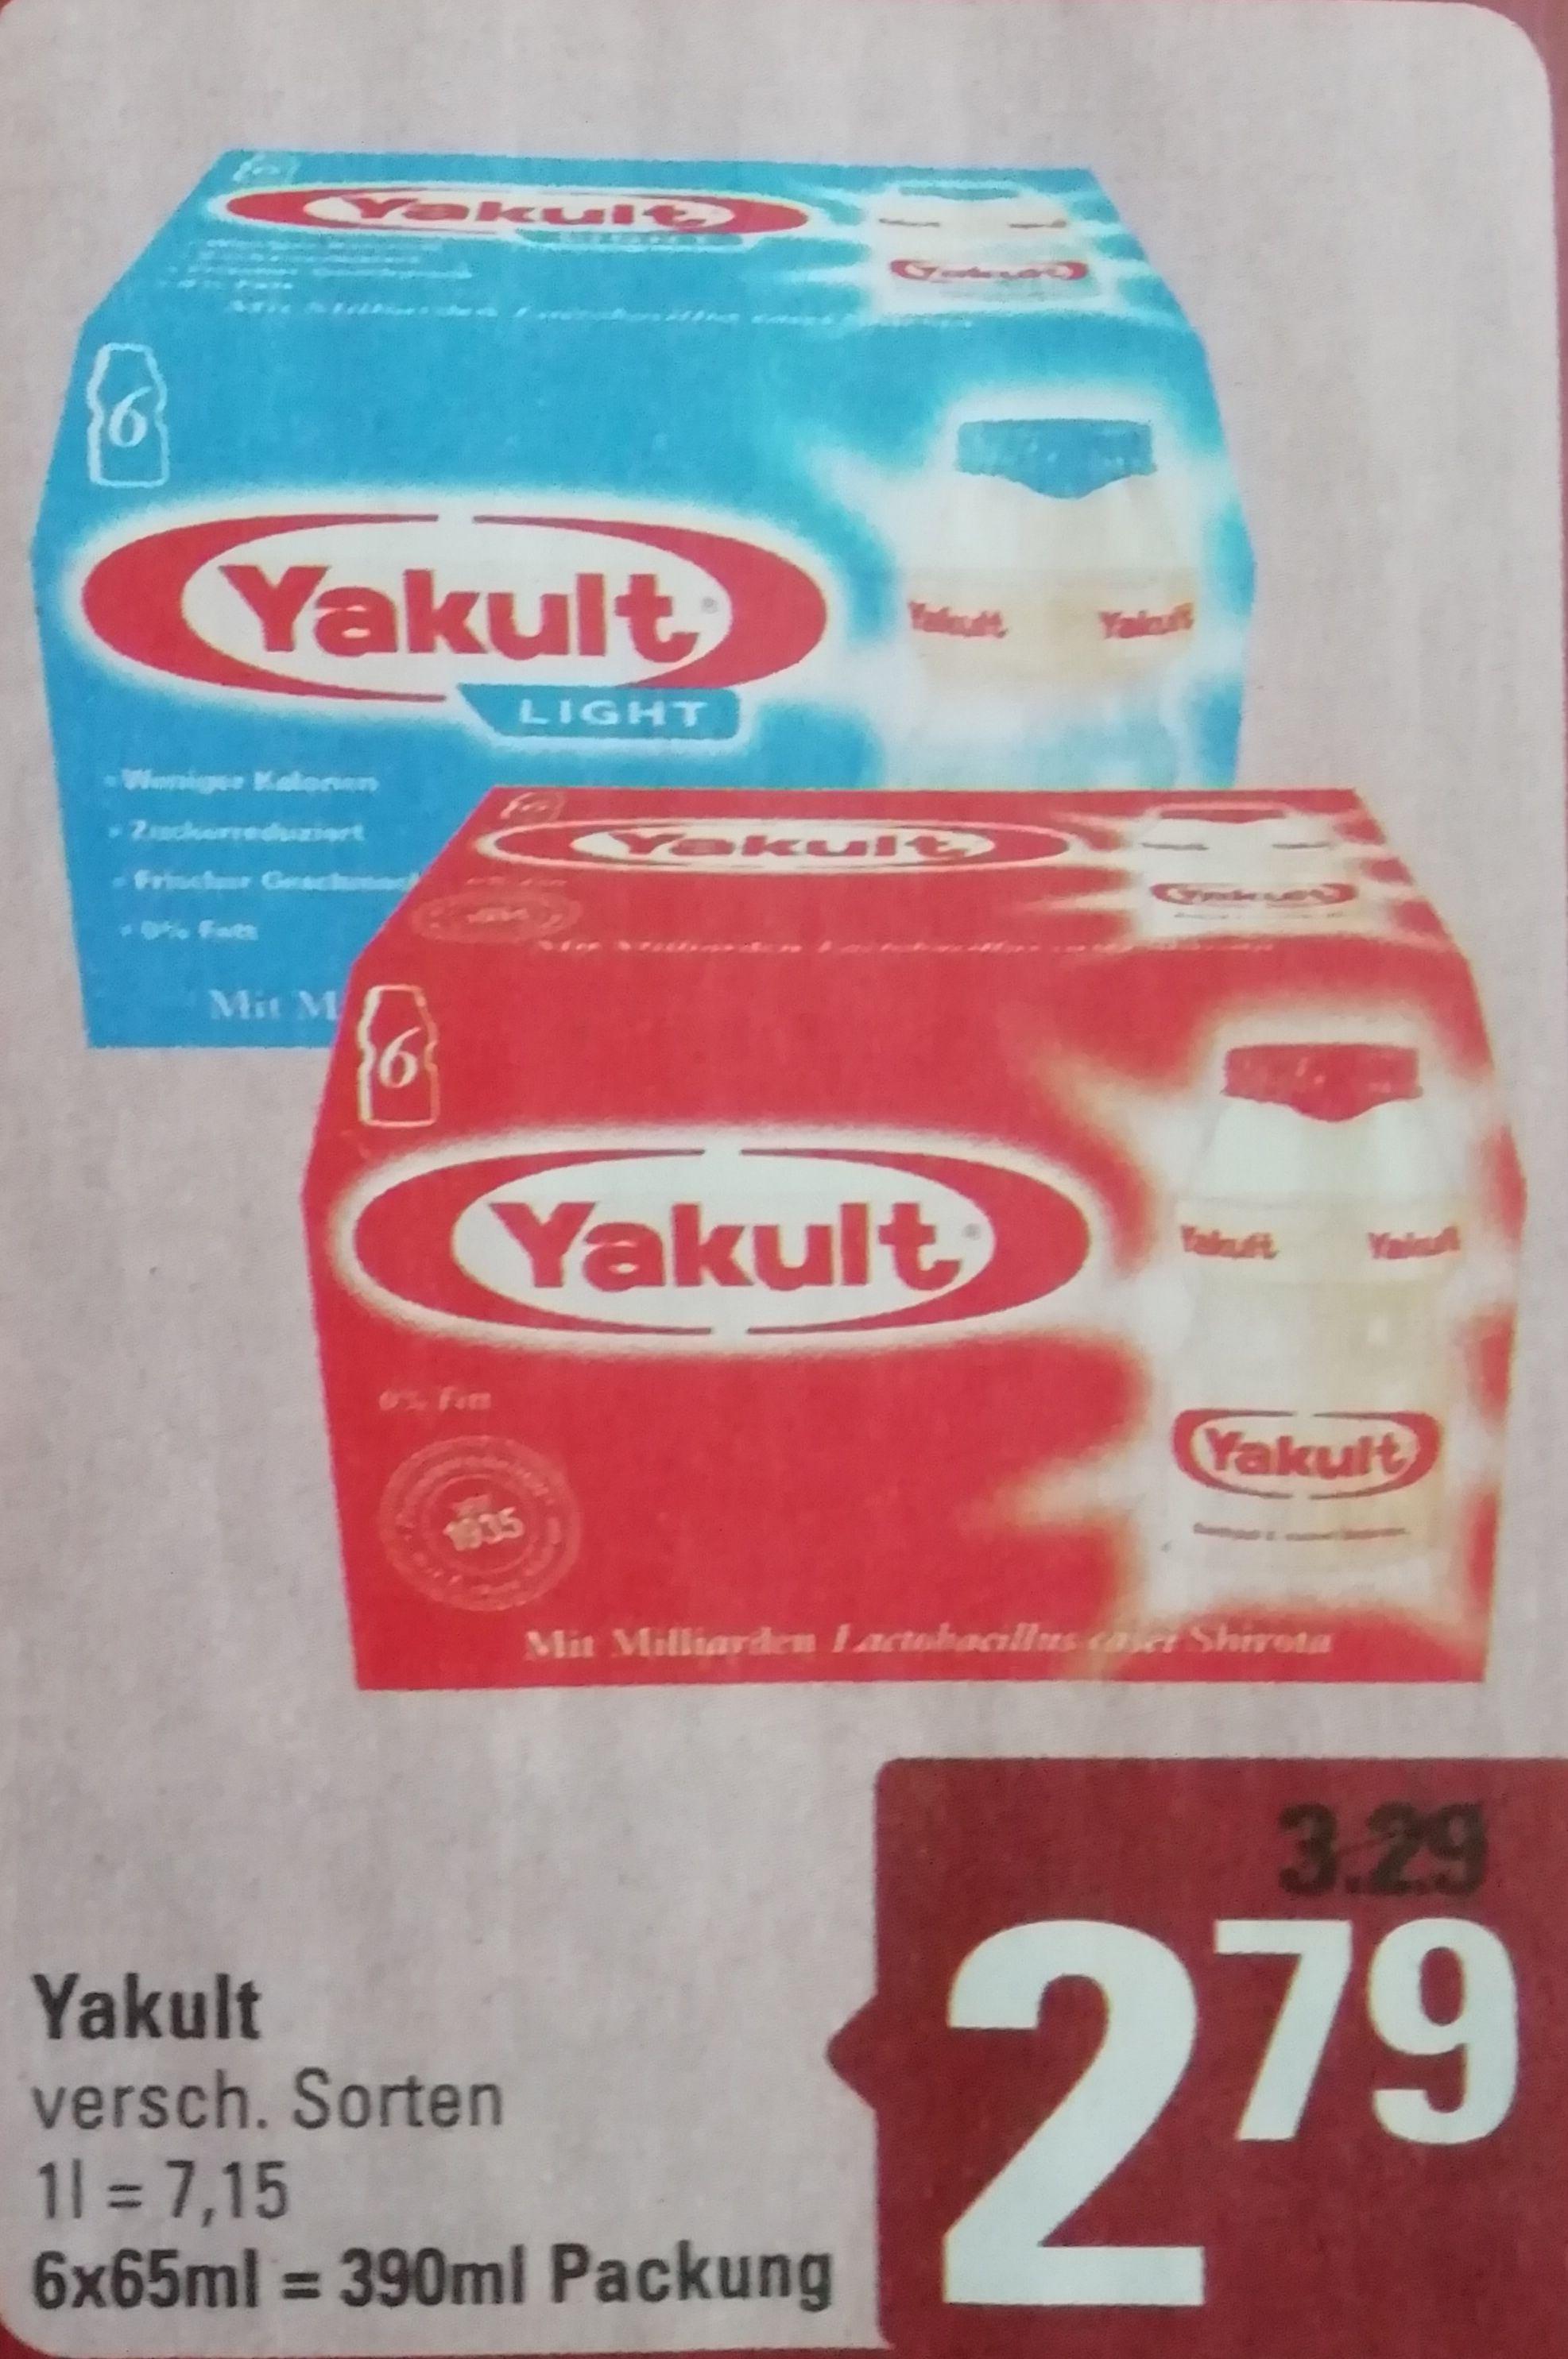 [Marktkauf Minden-Hannover ab 2.12] Yakult Original oder Plus dank Coupon 1,79 Euro